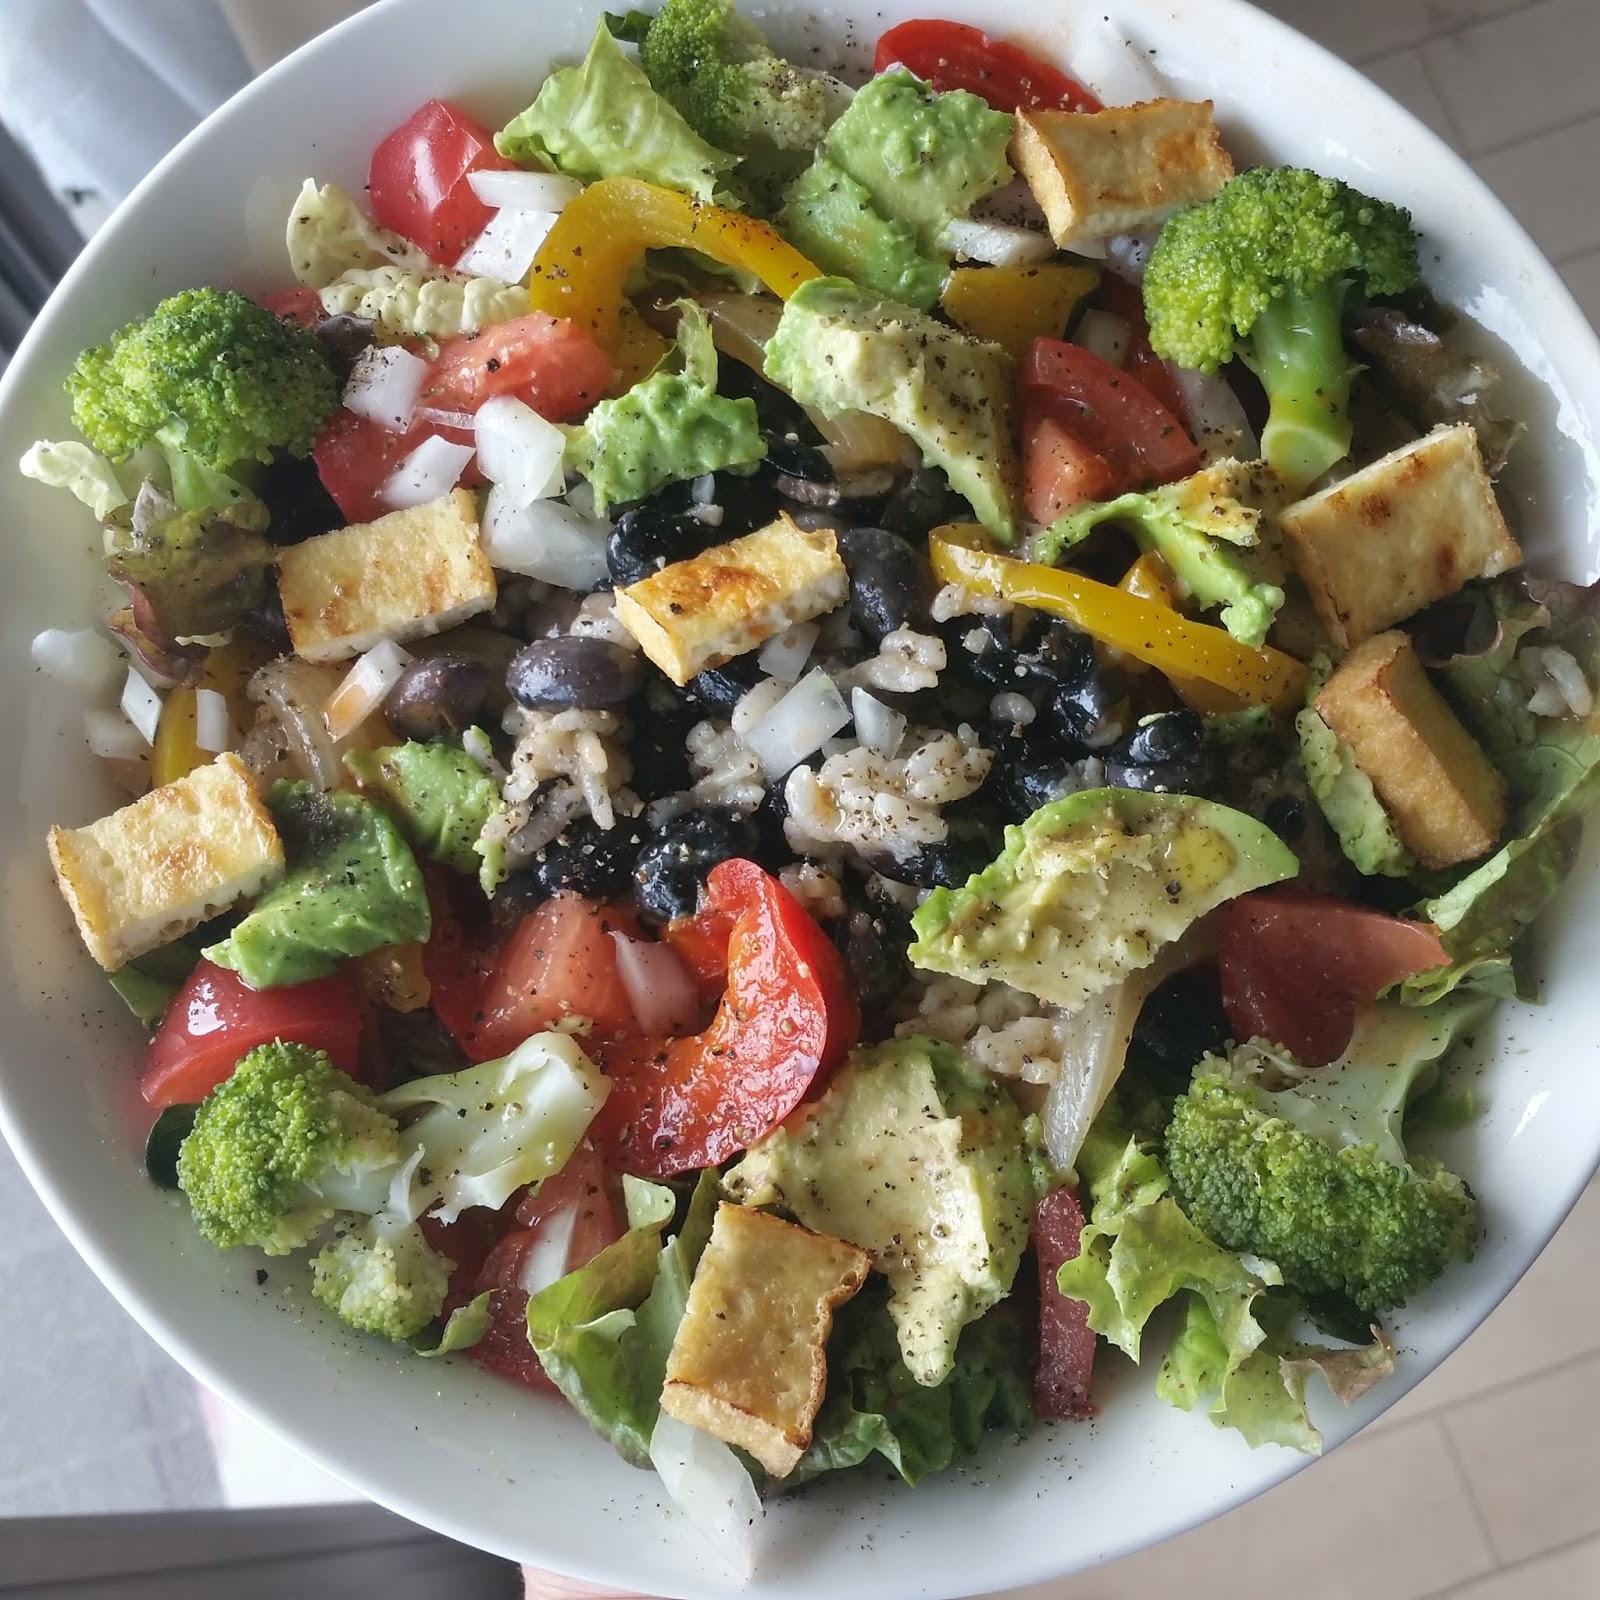 VEGAN Mom Blog - Vegan Pregnancy, Vegan Kids Food, Animal